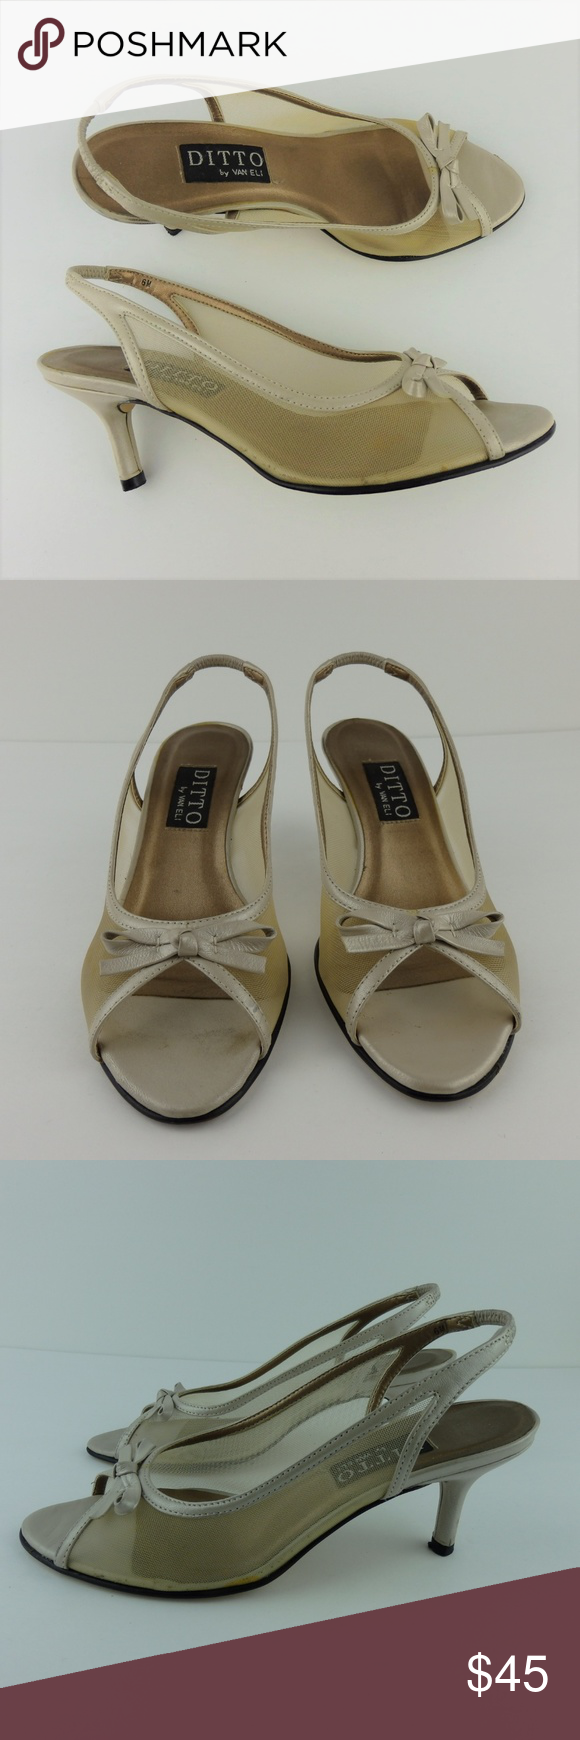 d508e119de7 ... added this listing on Poshmark  Ditto by VanEli Mesh Open Toe Kitten  Heels 6.  shopmycloset  poshmark  fashion  shopping  style  forsale  Vaneli   Shoes